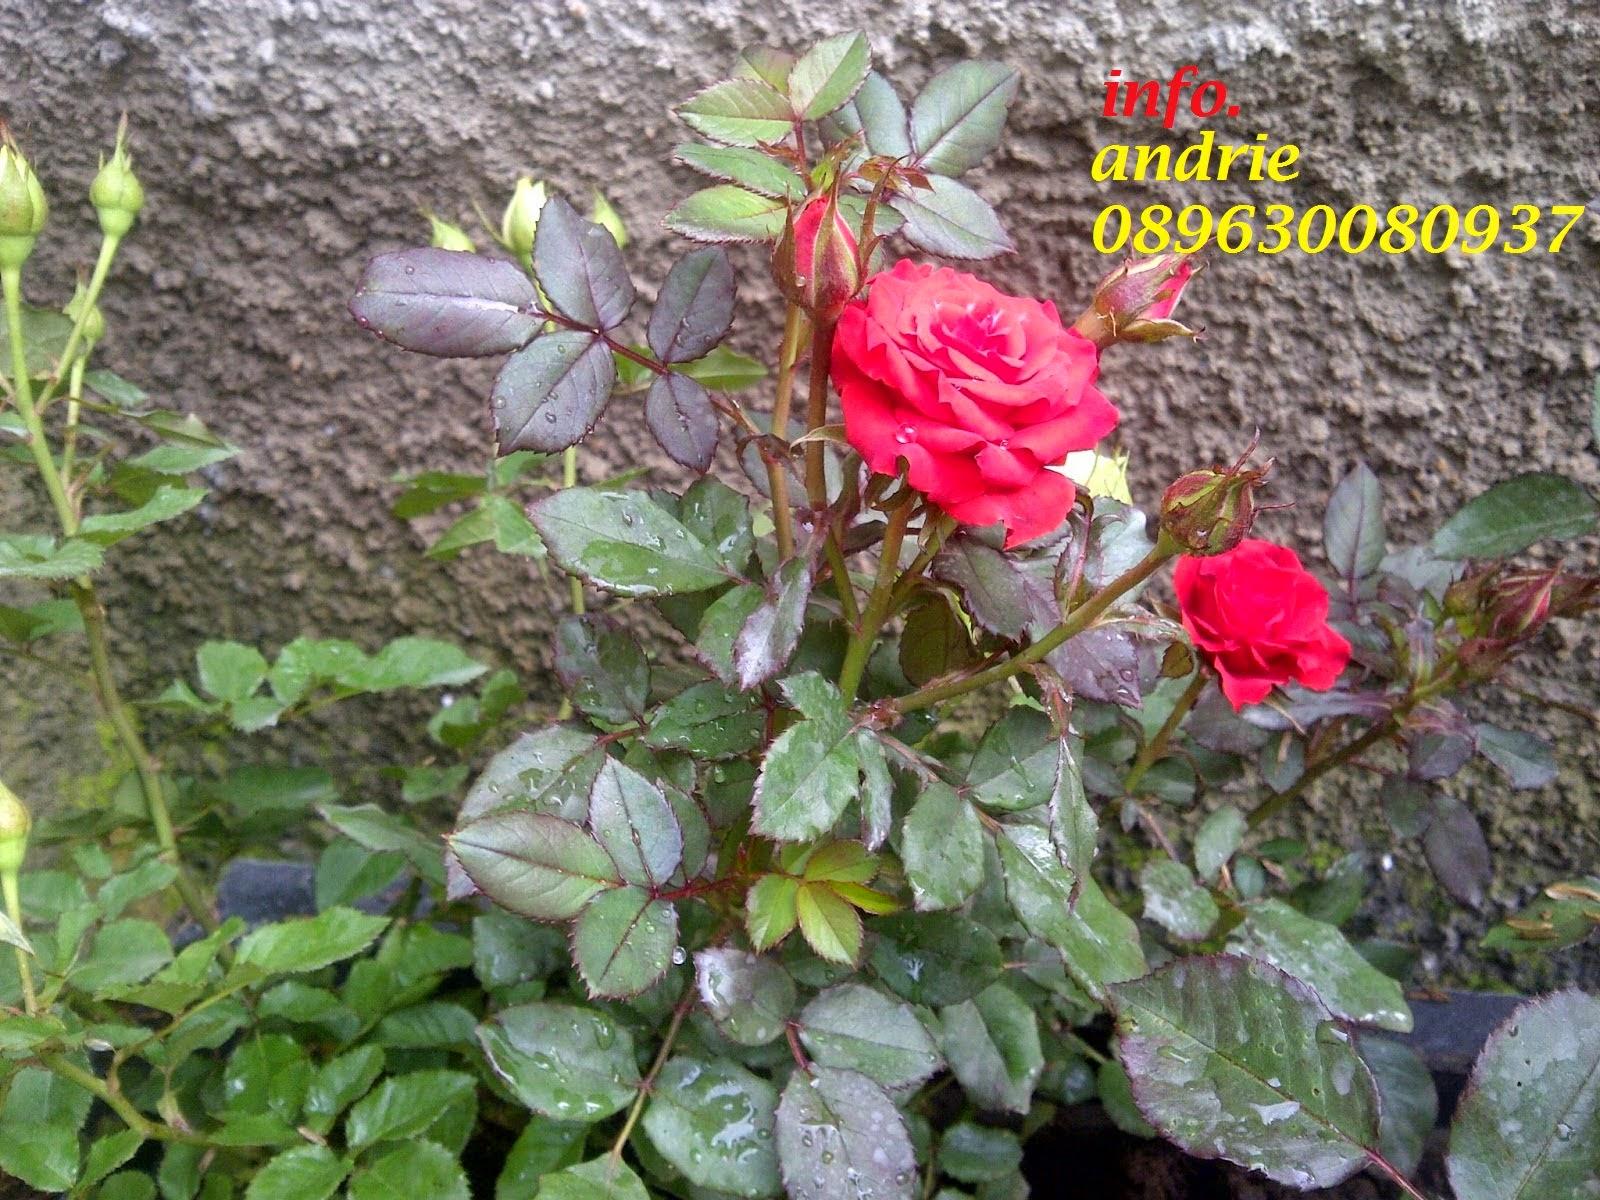 Gambar Tanaman Bunga Mawar Merah Informasi Seputar Tanaman Hias